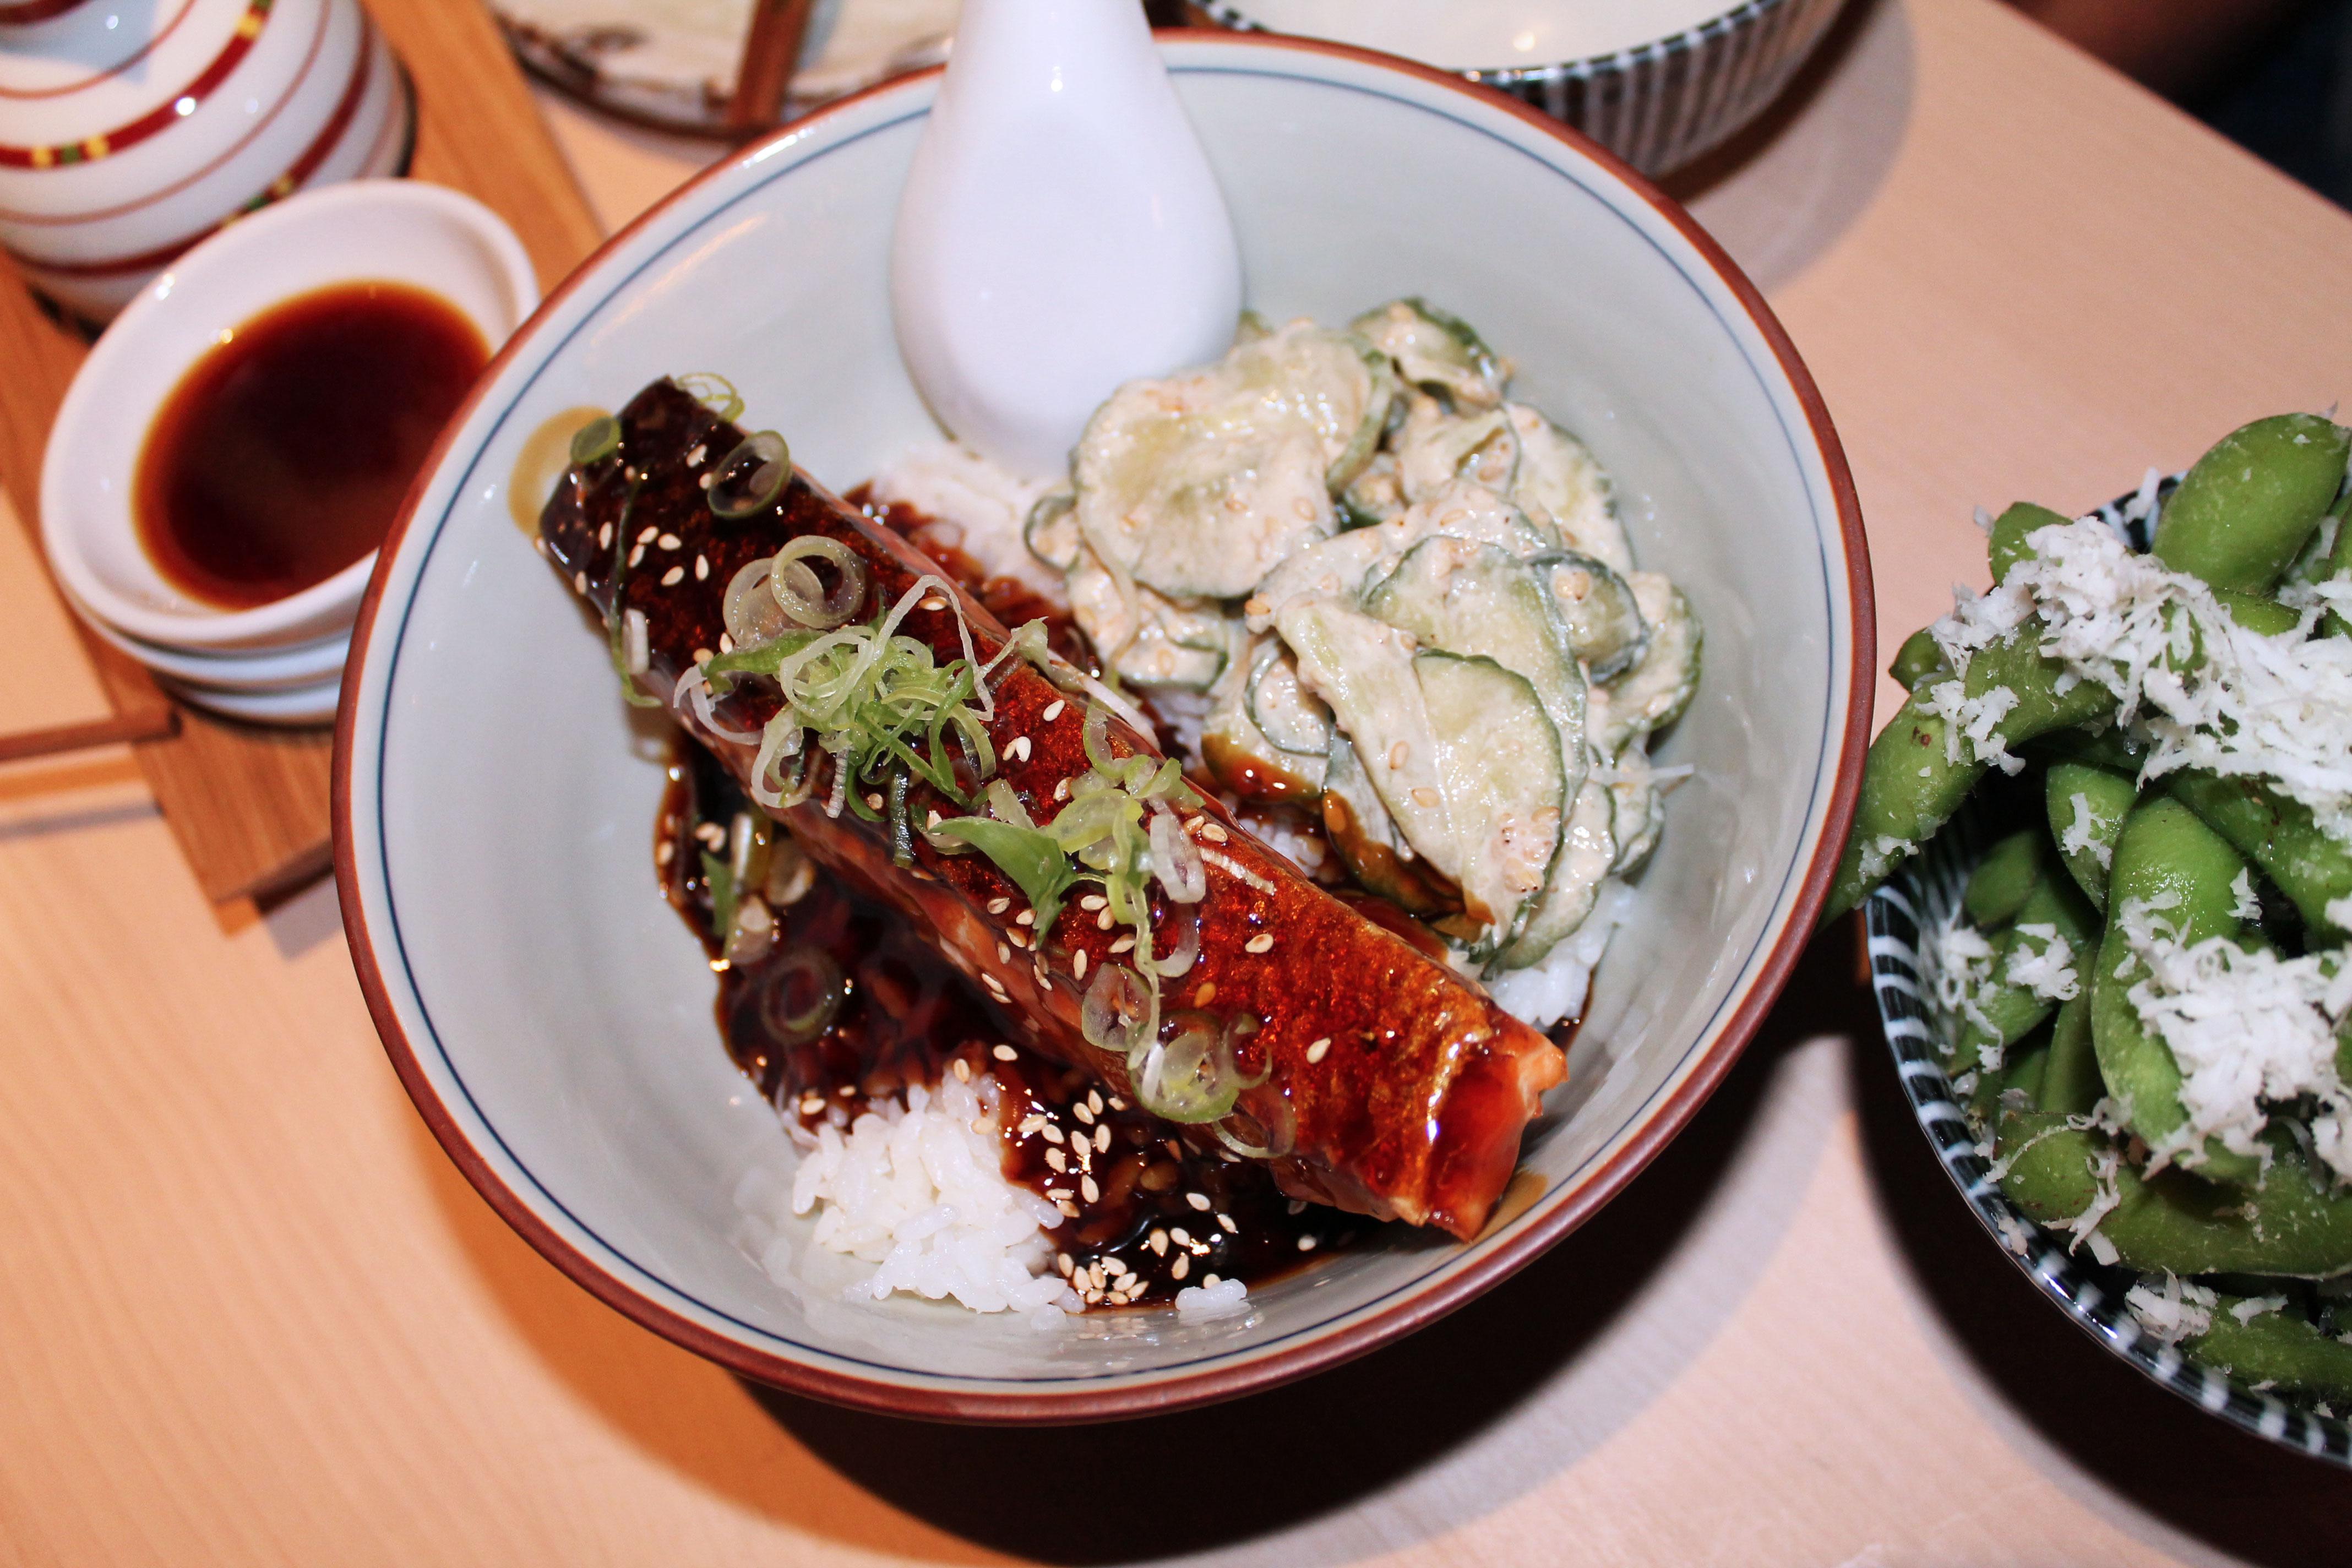 kardiaserena-iki-restaurant-erste-campus-lokaltipp-sake-don-gegrilltes-lachsfilet-teriyaki-sauce